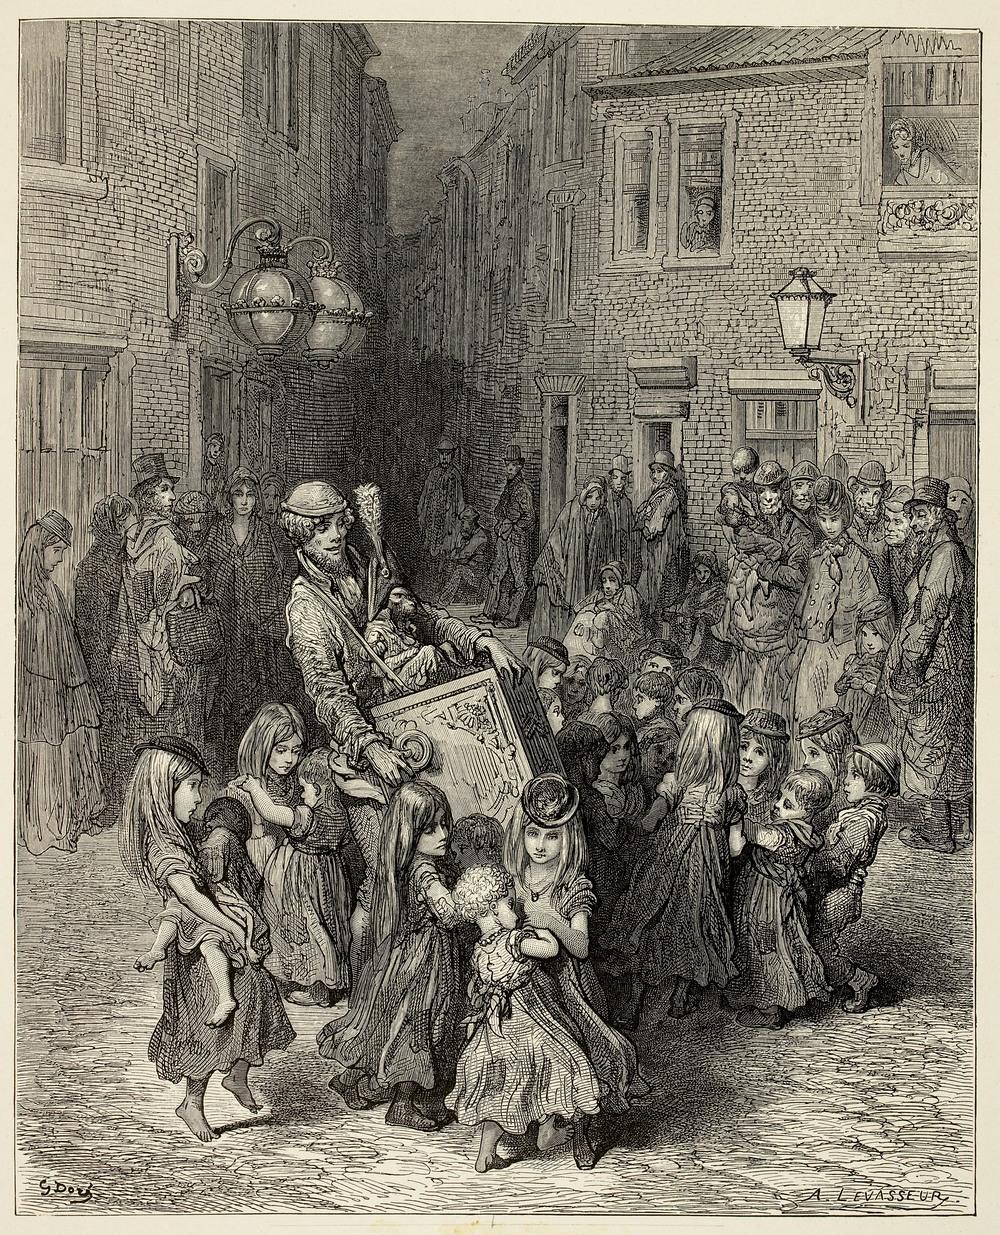 Gustave Doré's Victorian London